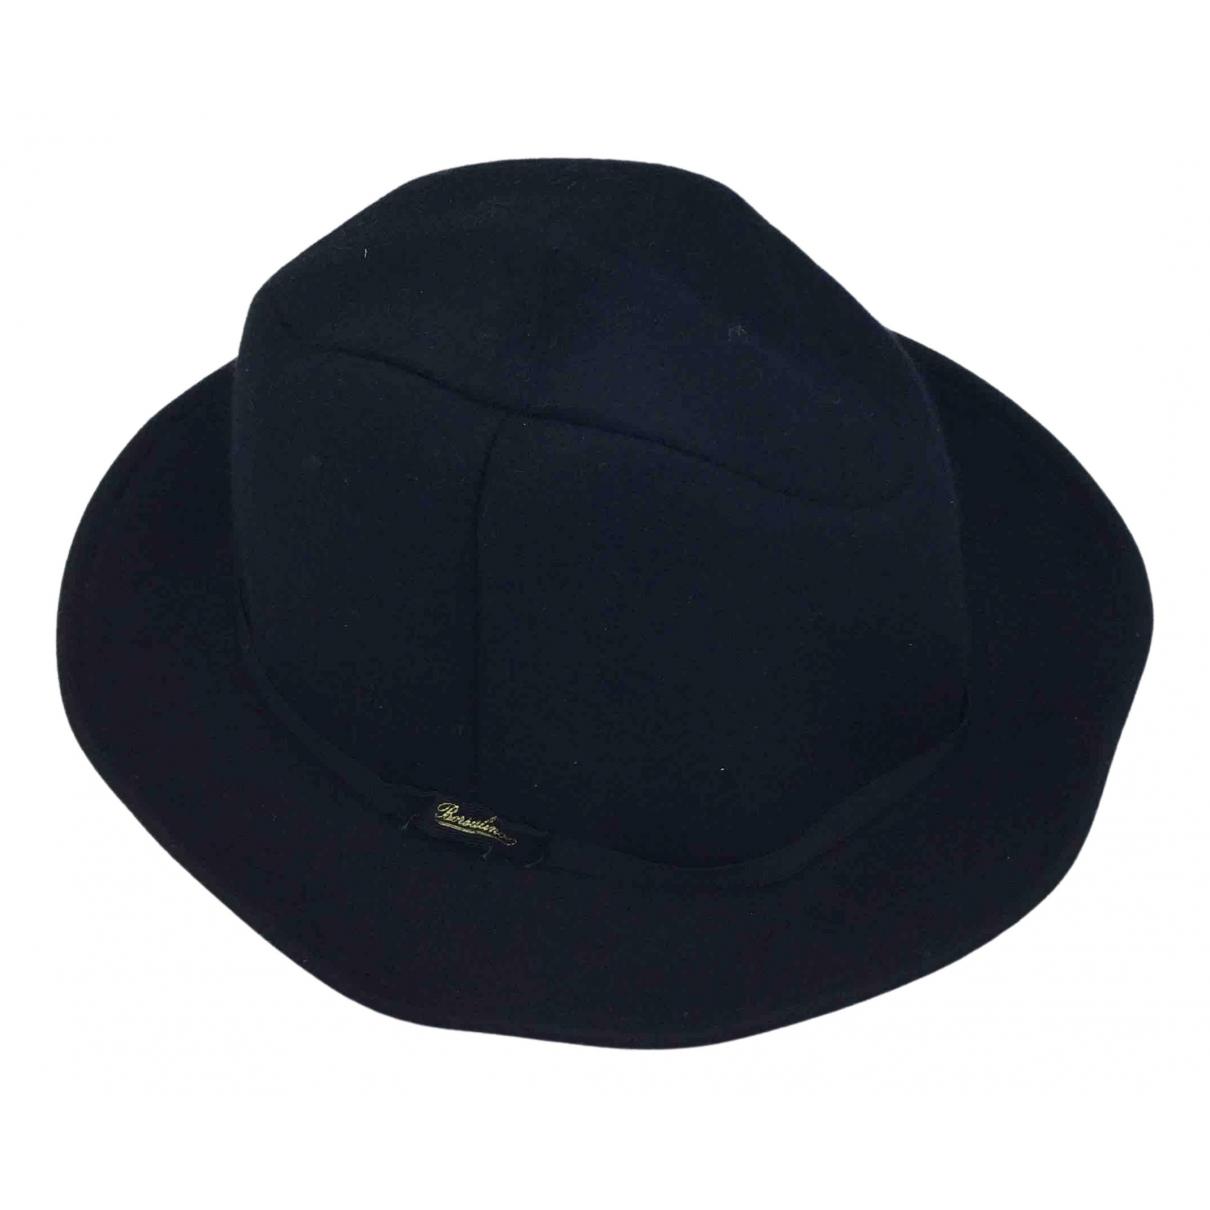 Borsalino \N Black Wool hat for Women M International